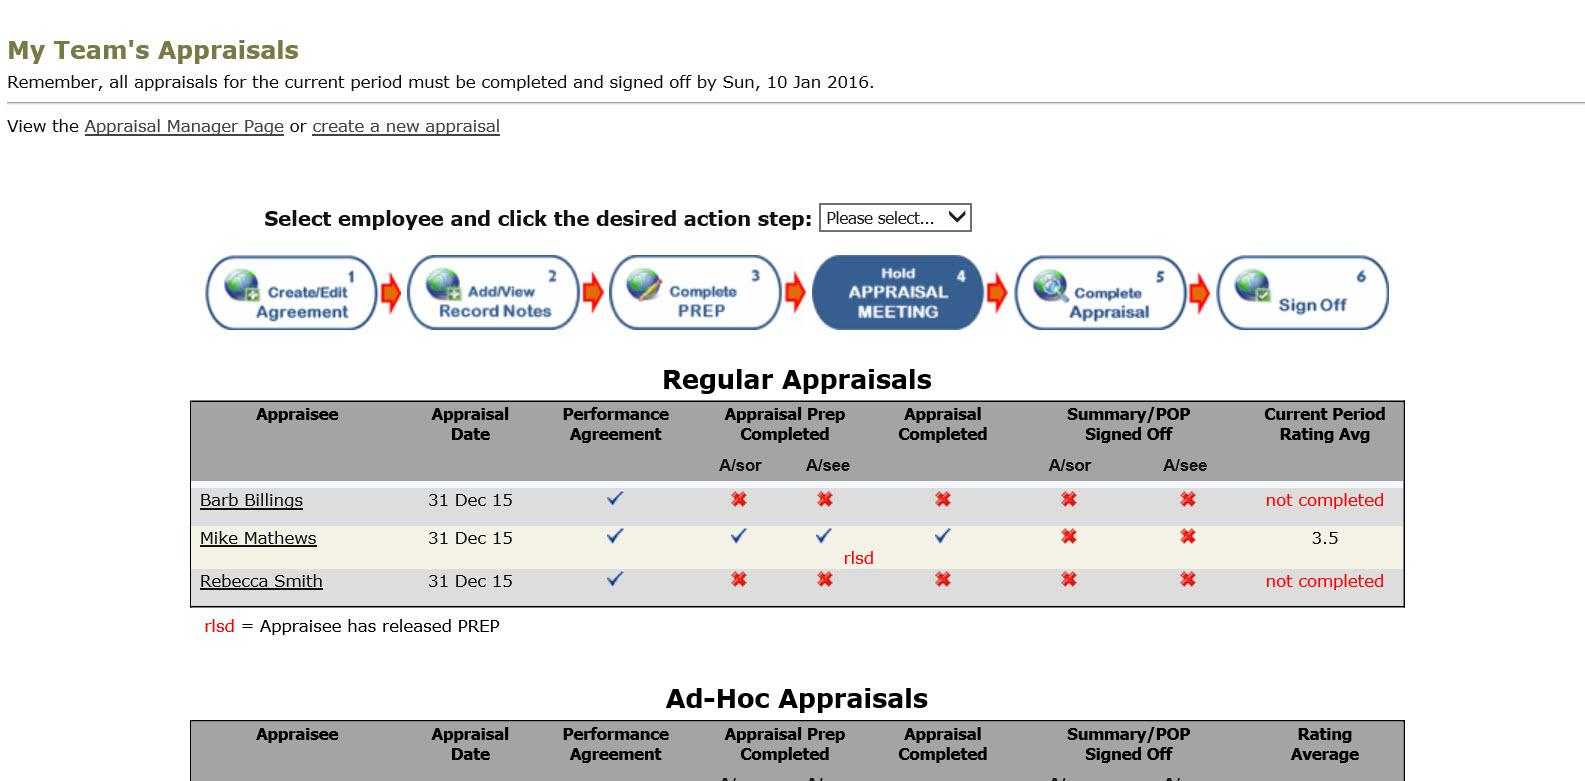 Team appraisal page